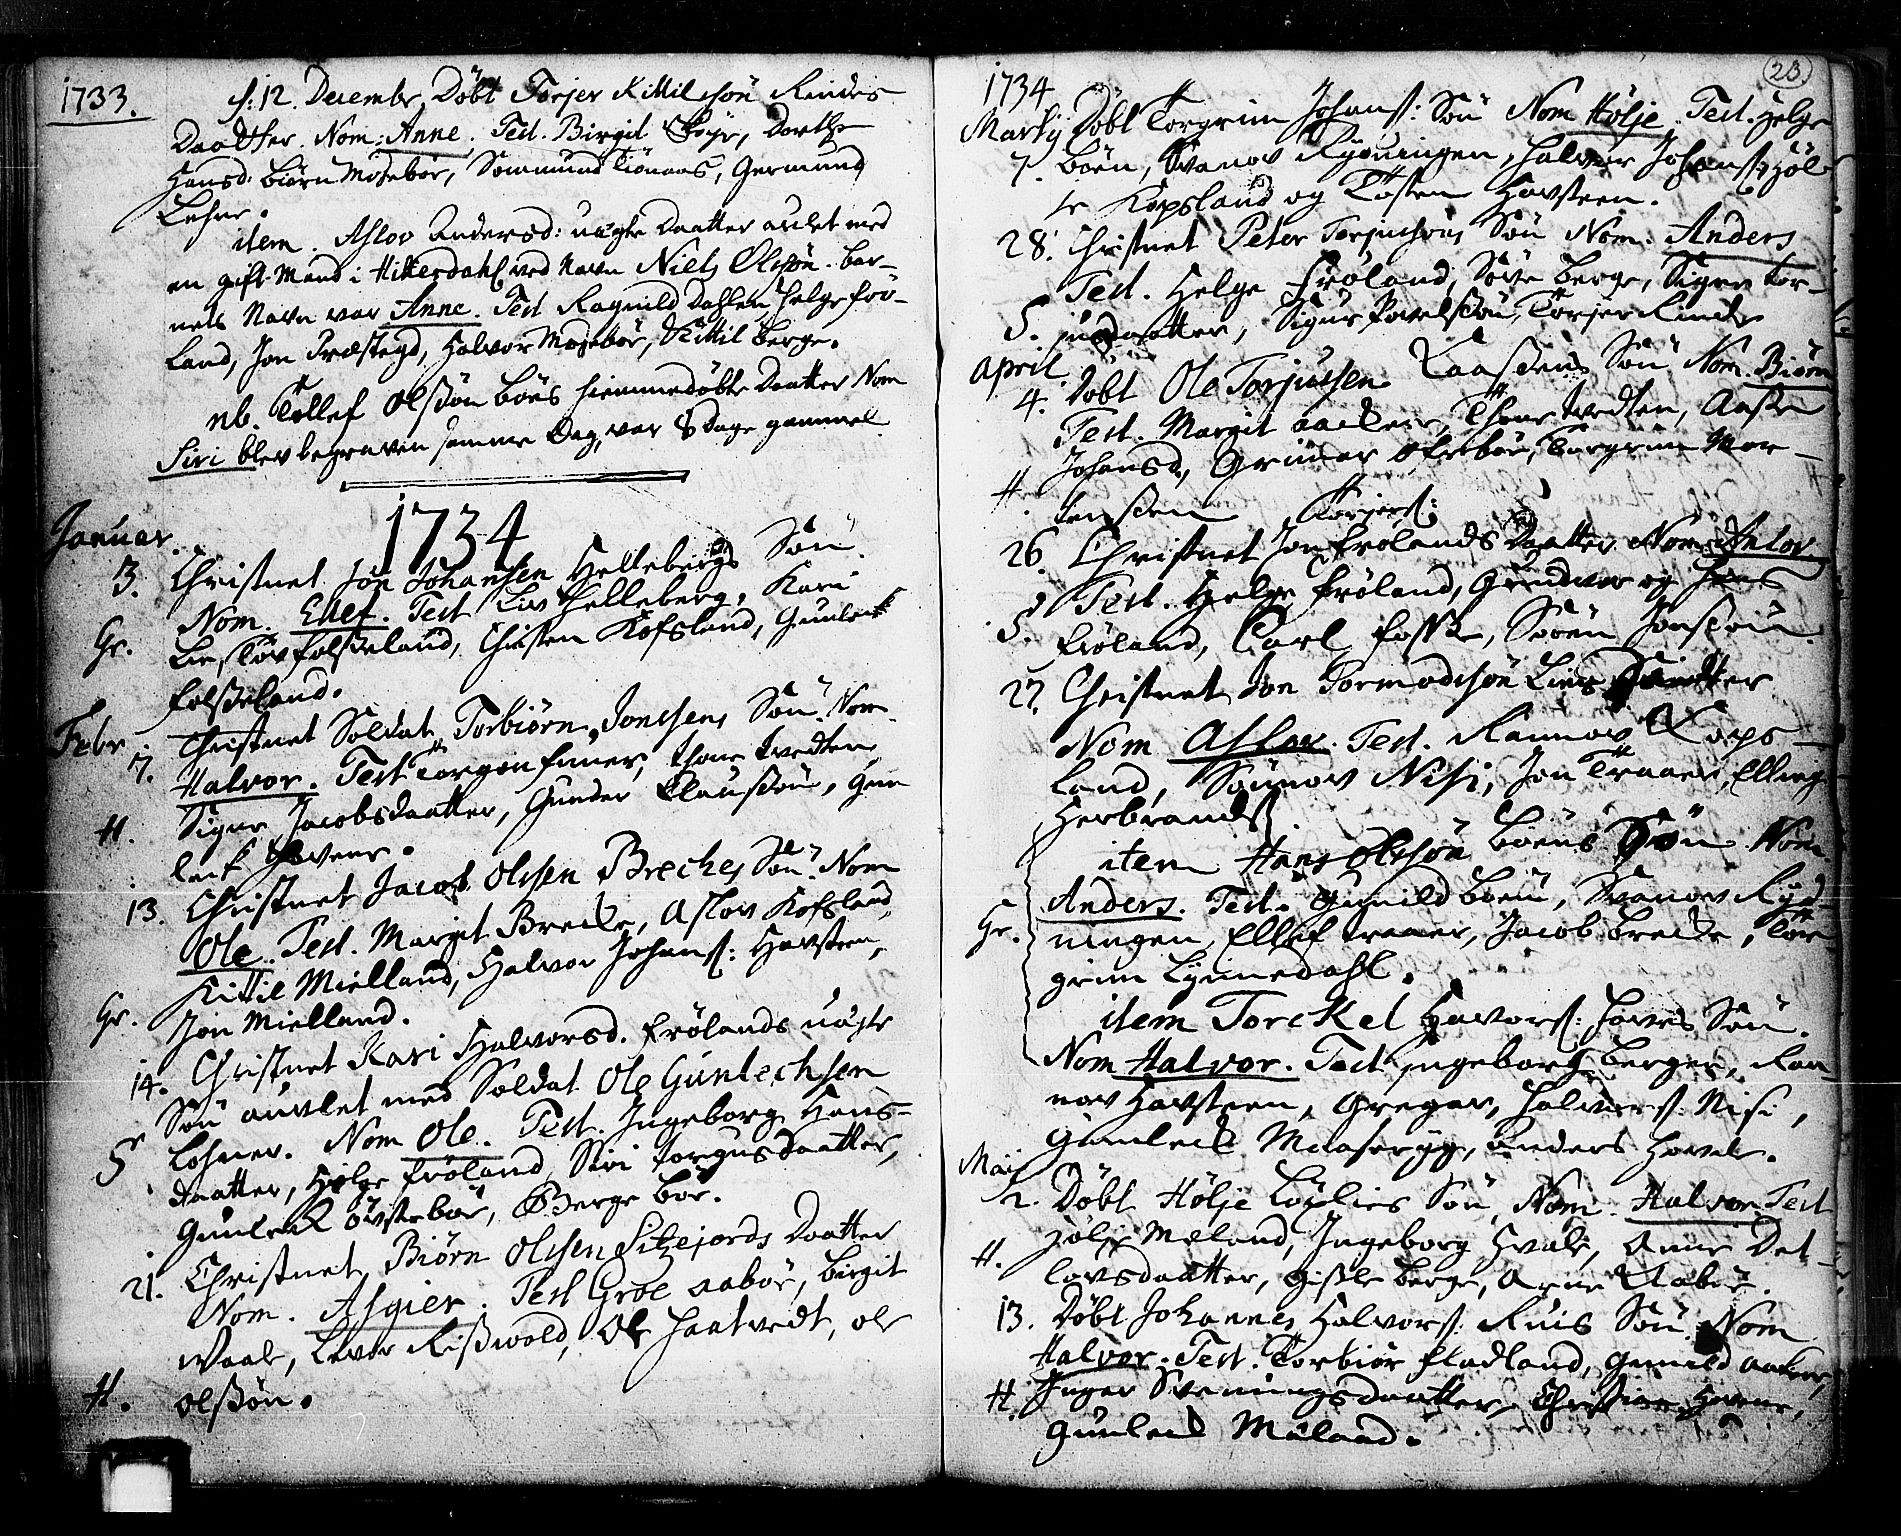 SAKO, Hjartdal kirkebøker, F/Fa/L0003: Ministerialbok nr. I 3, 1727-1775, s. 23